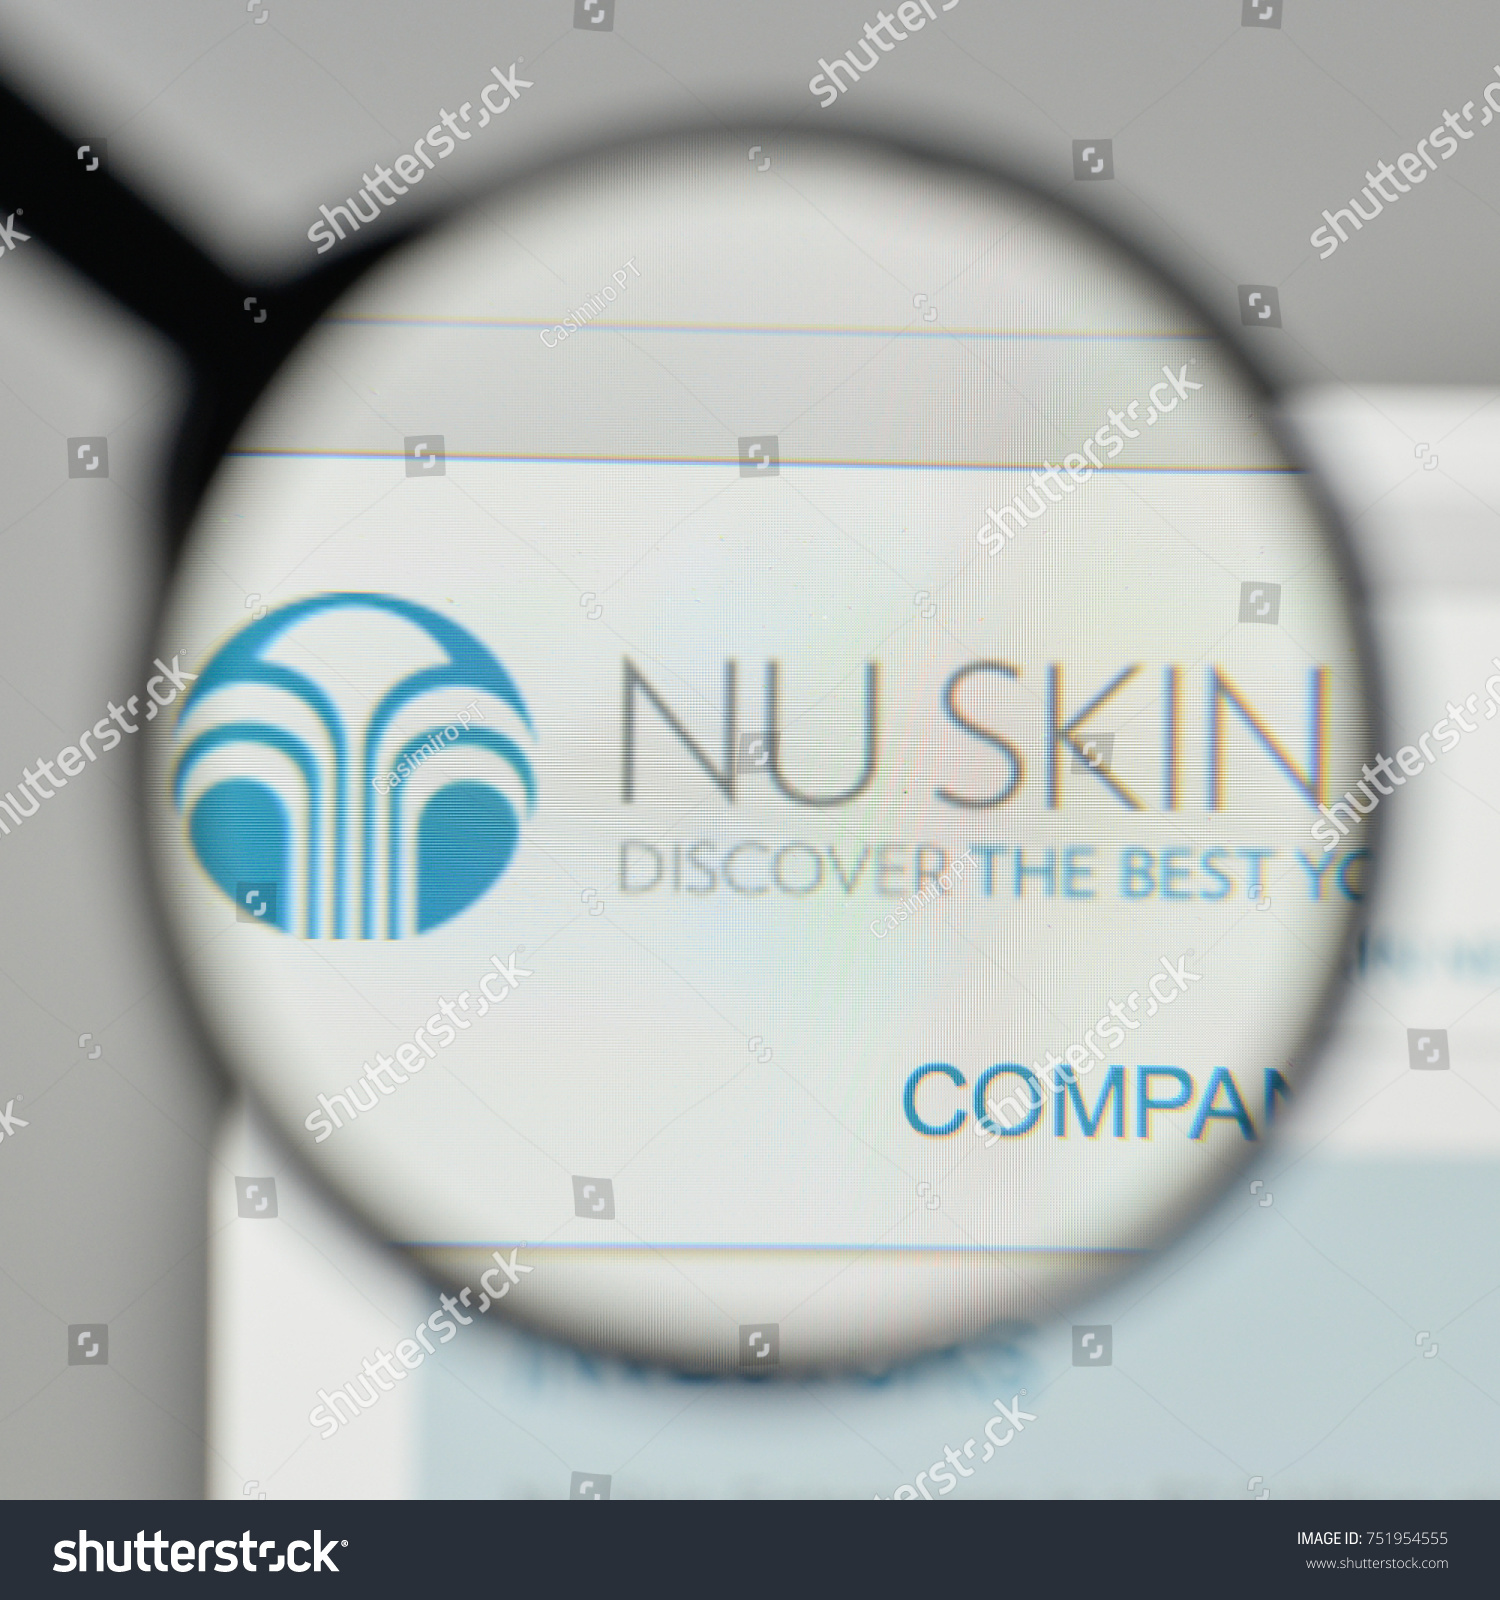 Milan italy november 1 2017 nu stock photo 751954555 shutterstock milan italy november 1 2017 nu skin enterprises logo on the website buycottarizona Gallery